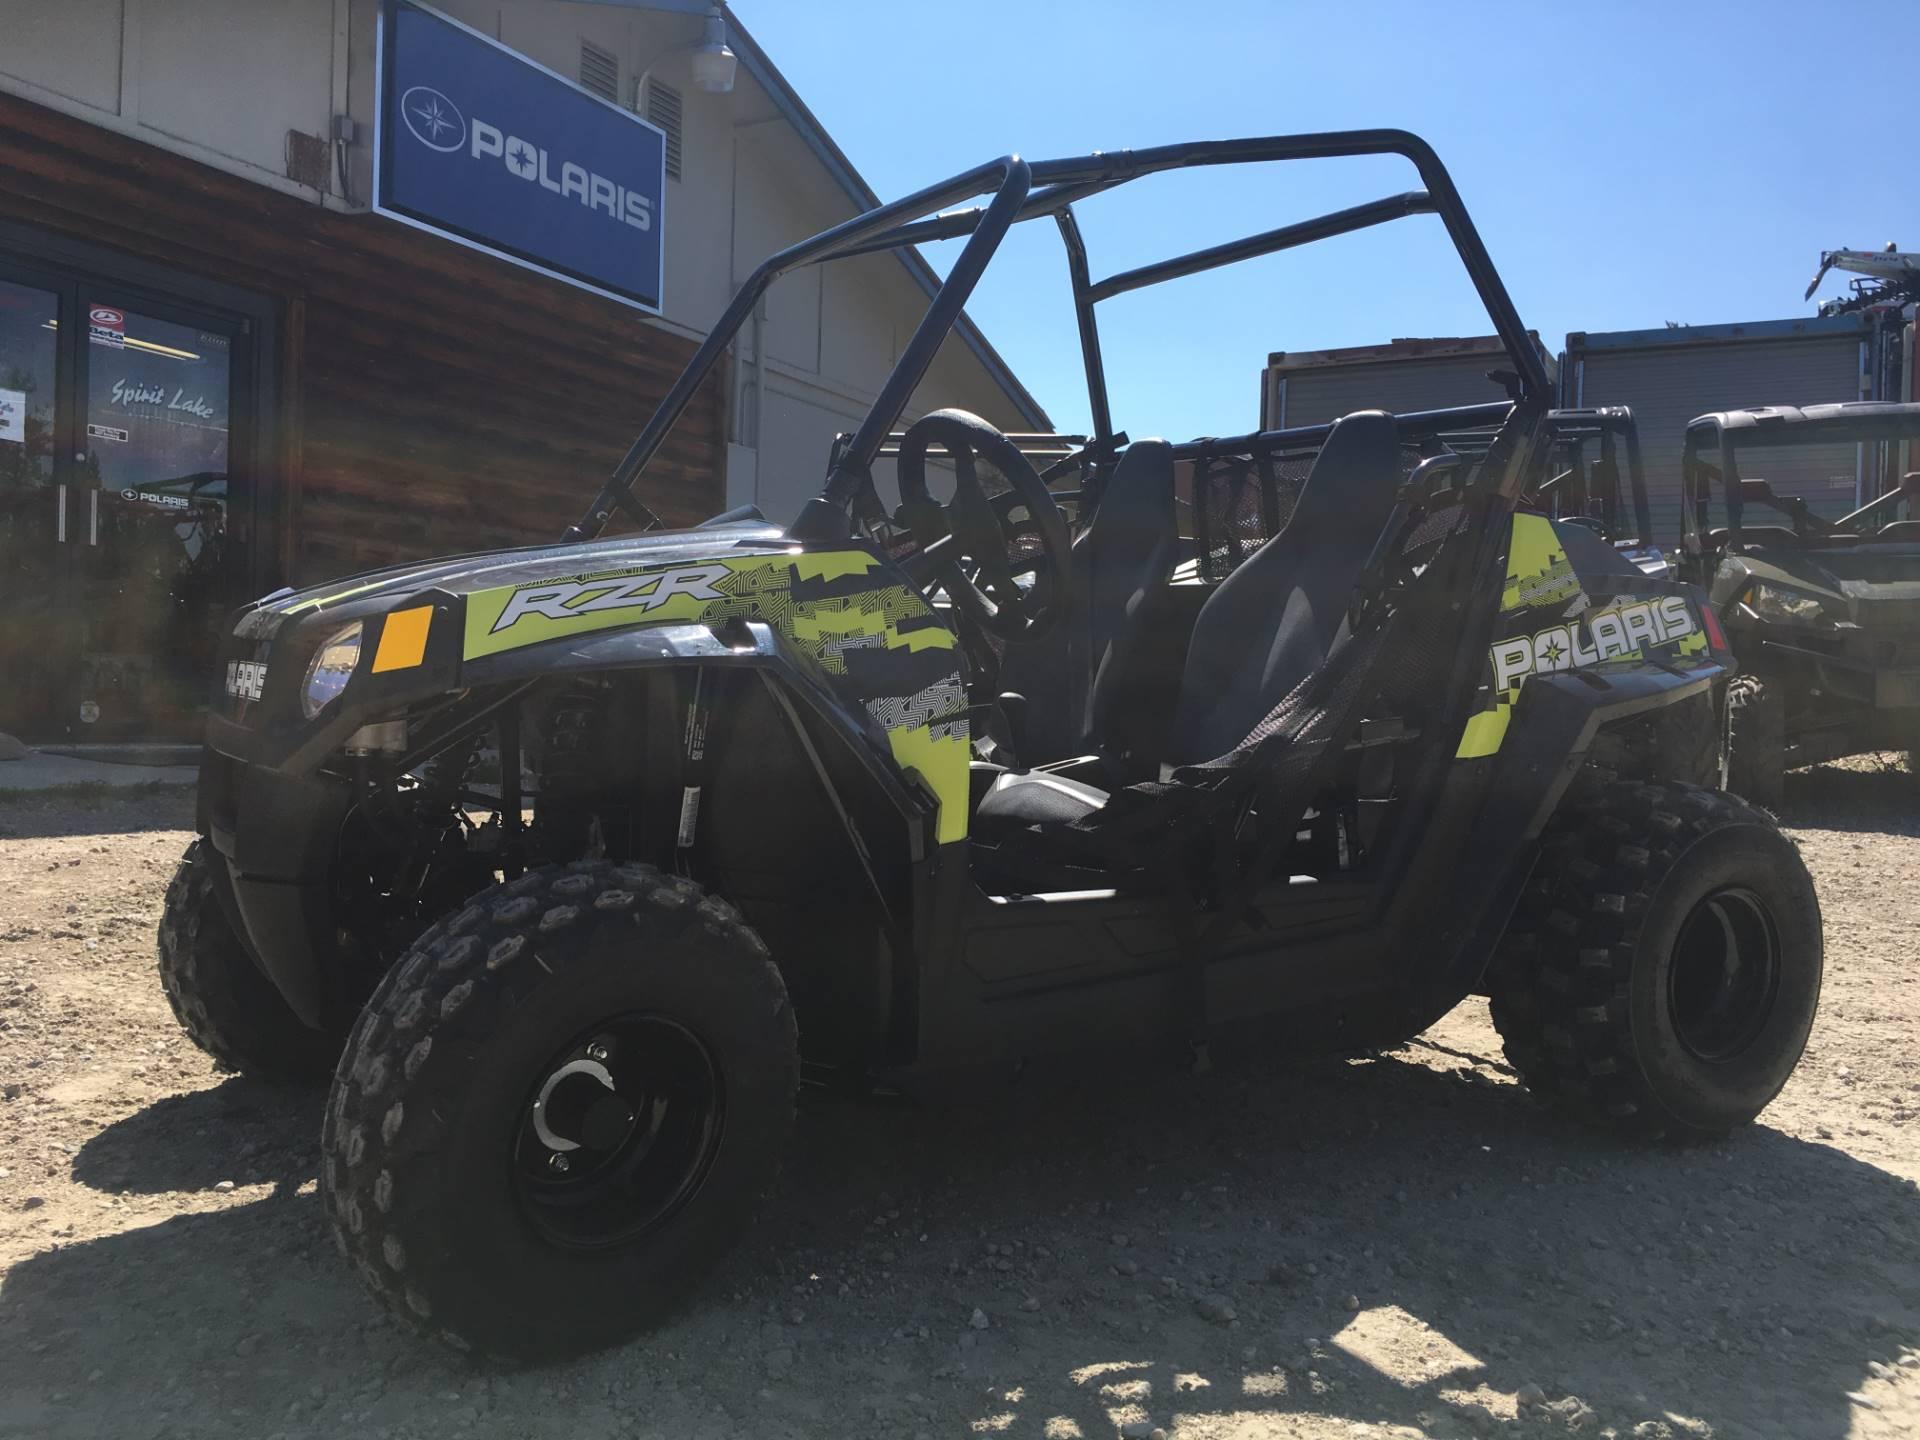 2019 Polaris RZR 170 EFI in Grand Lake, Colorado